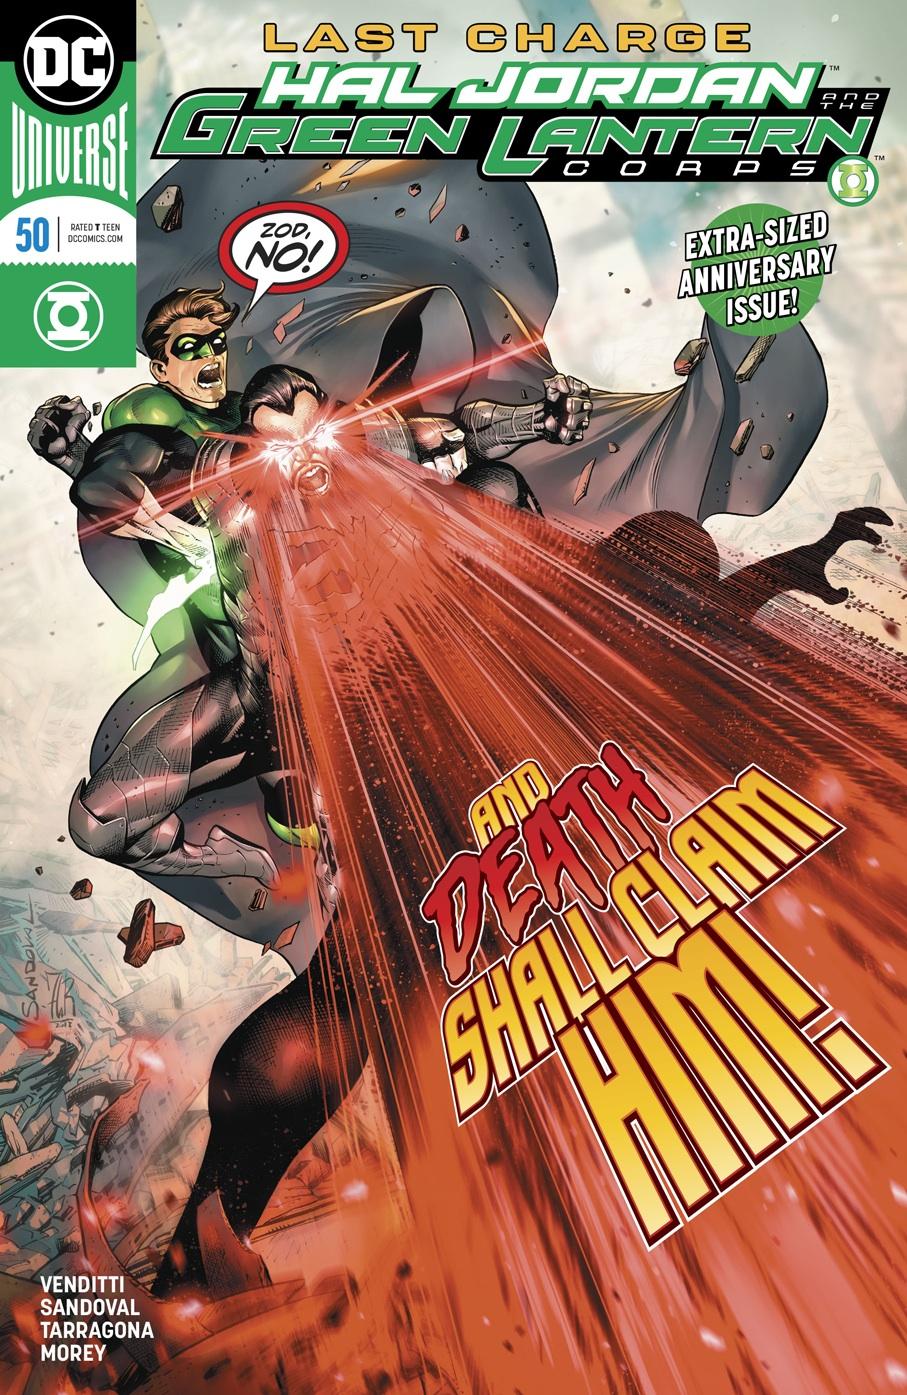 Hal jordan and the green lantern corps #24 | Green lantern